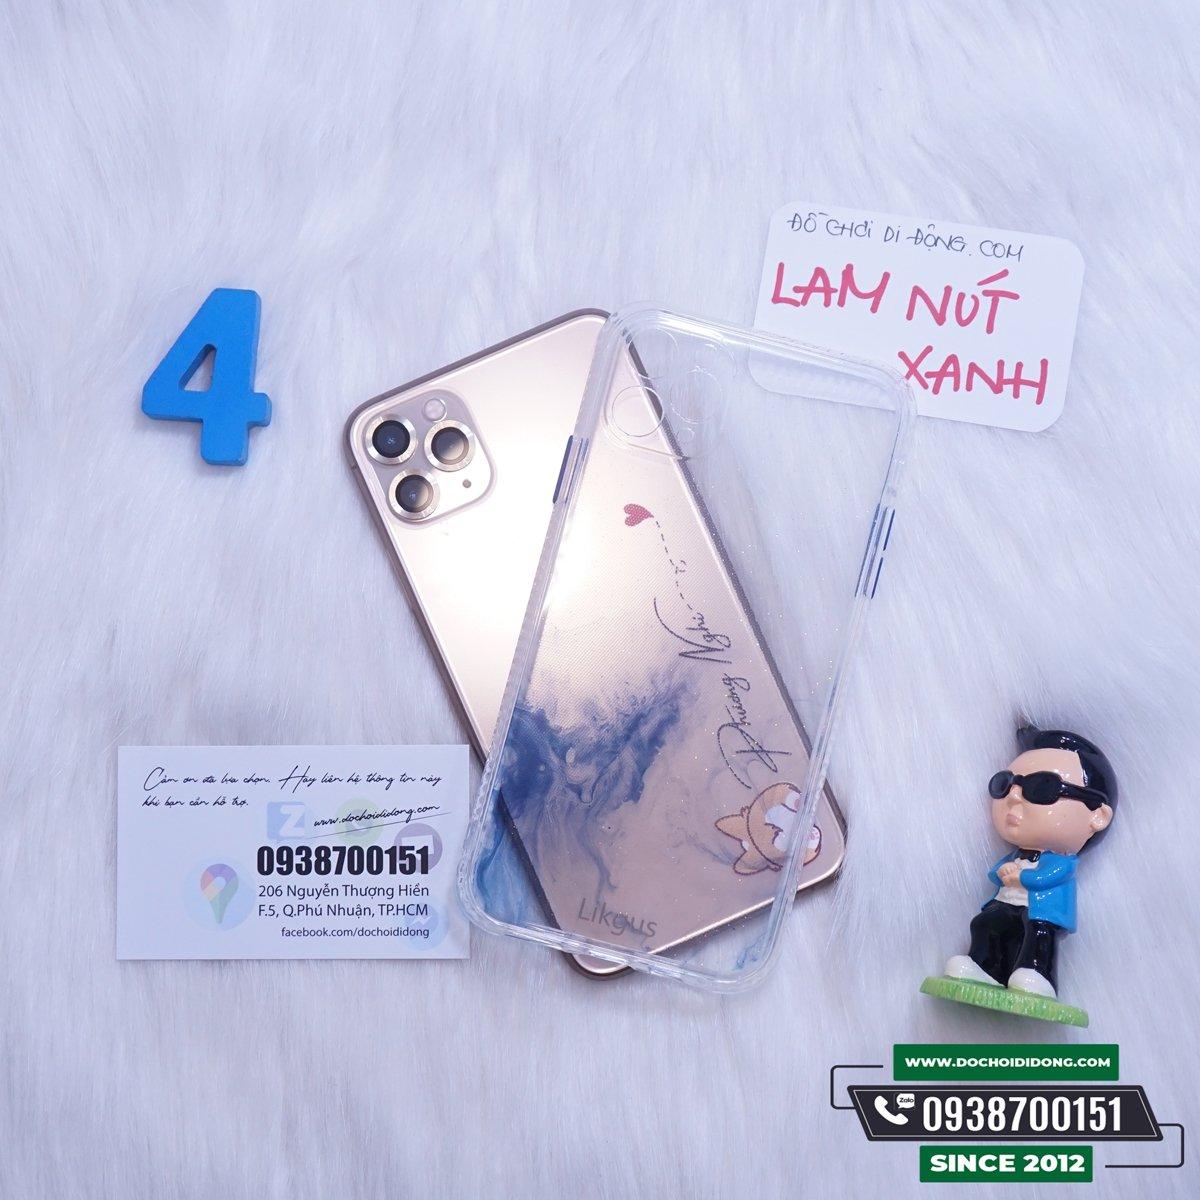 op-lung-iphone-11-pro-max-likgus-vien-trong-lung-van-da-cam-thach-chong-soc